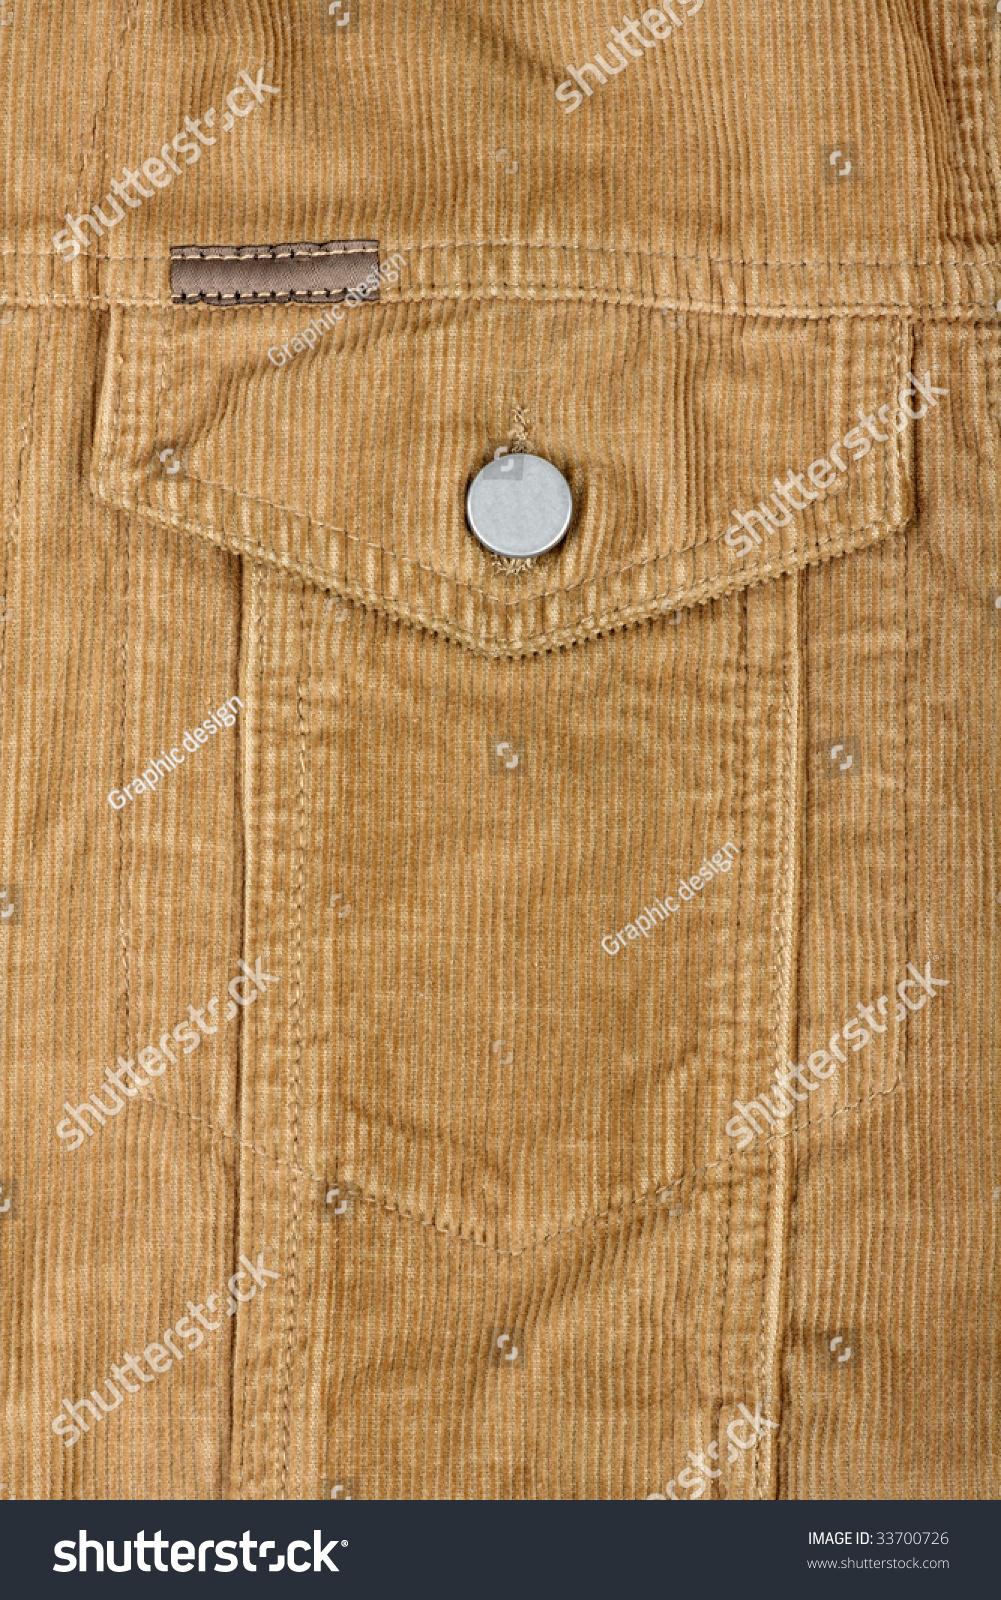 a pocket for corduroy pdf